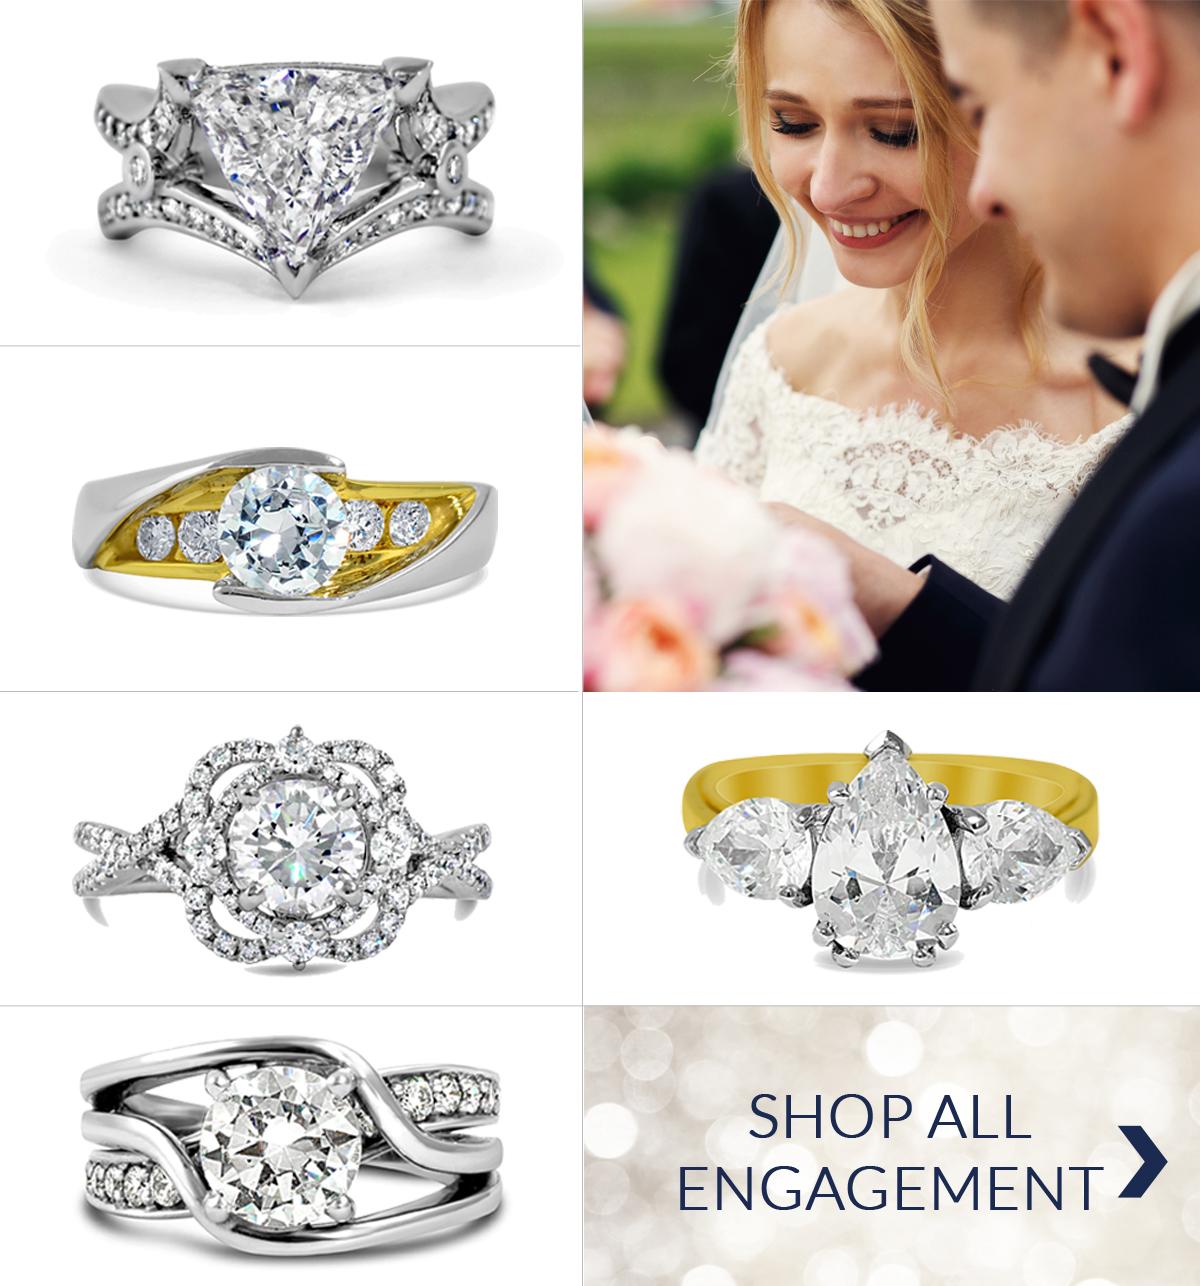 Mark-Michael-Diamond-Designs-Engagement Rings to Admire.jpg